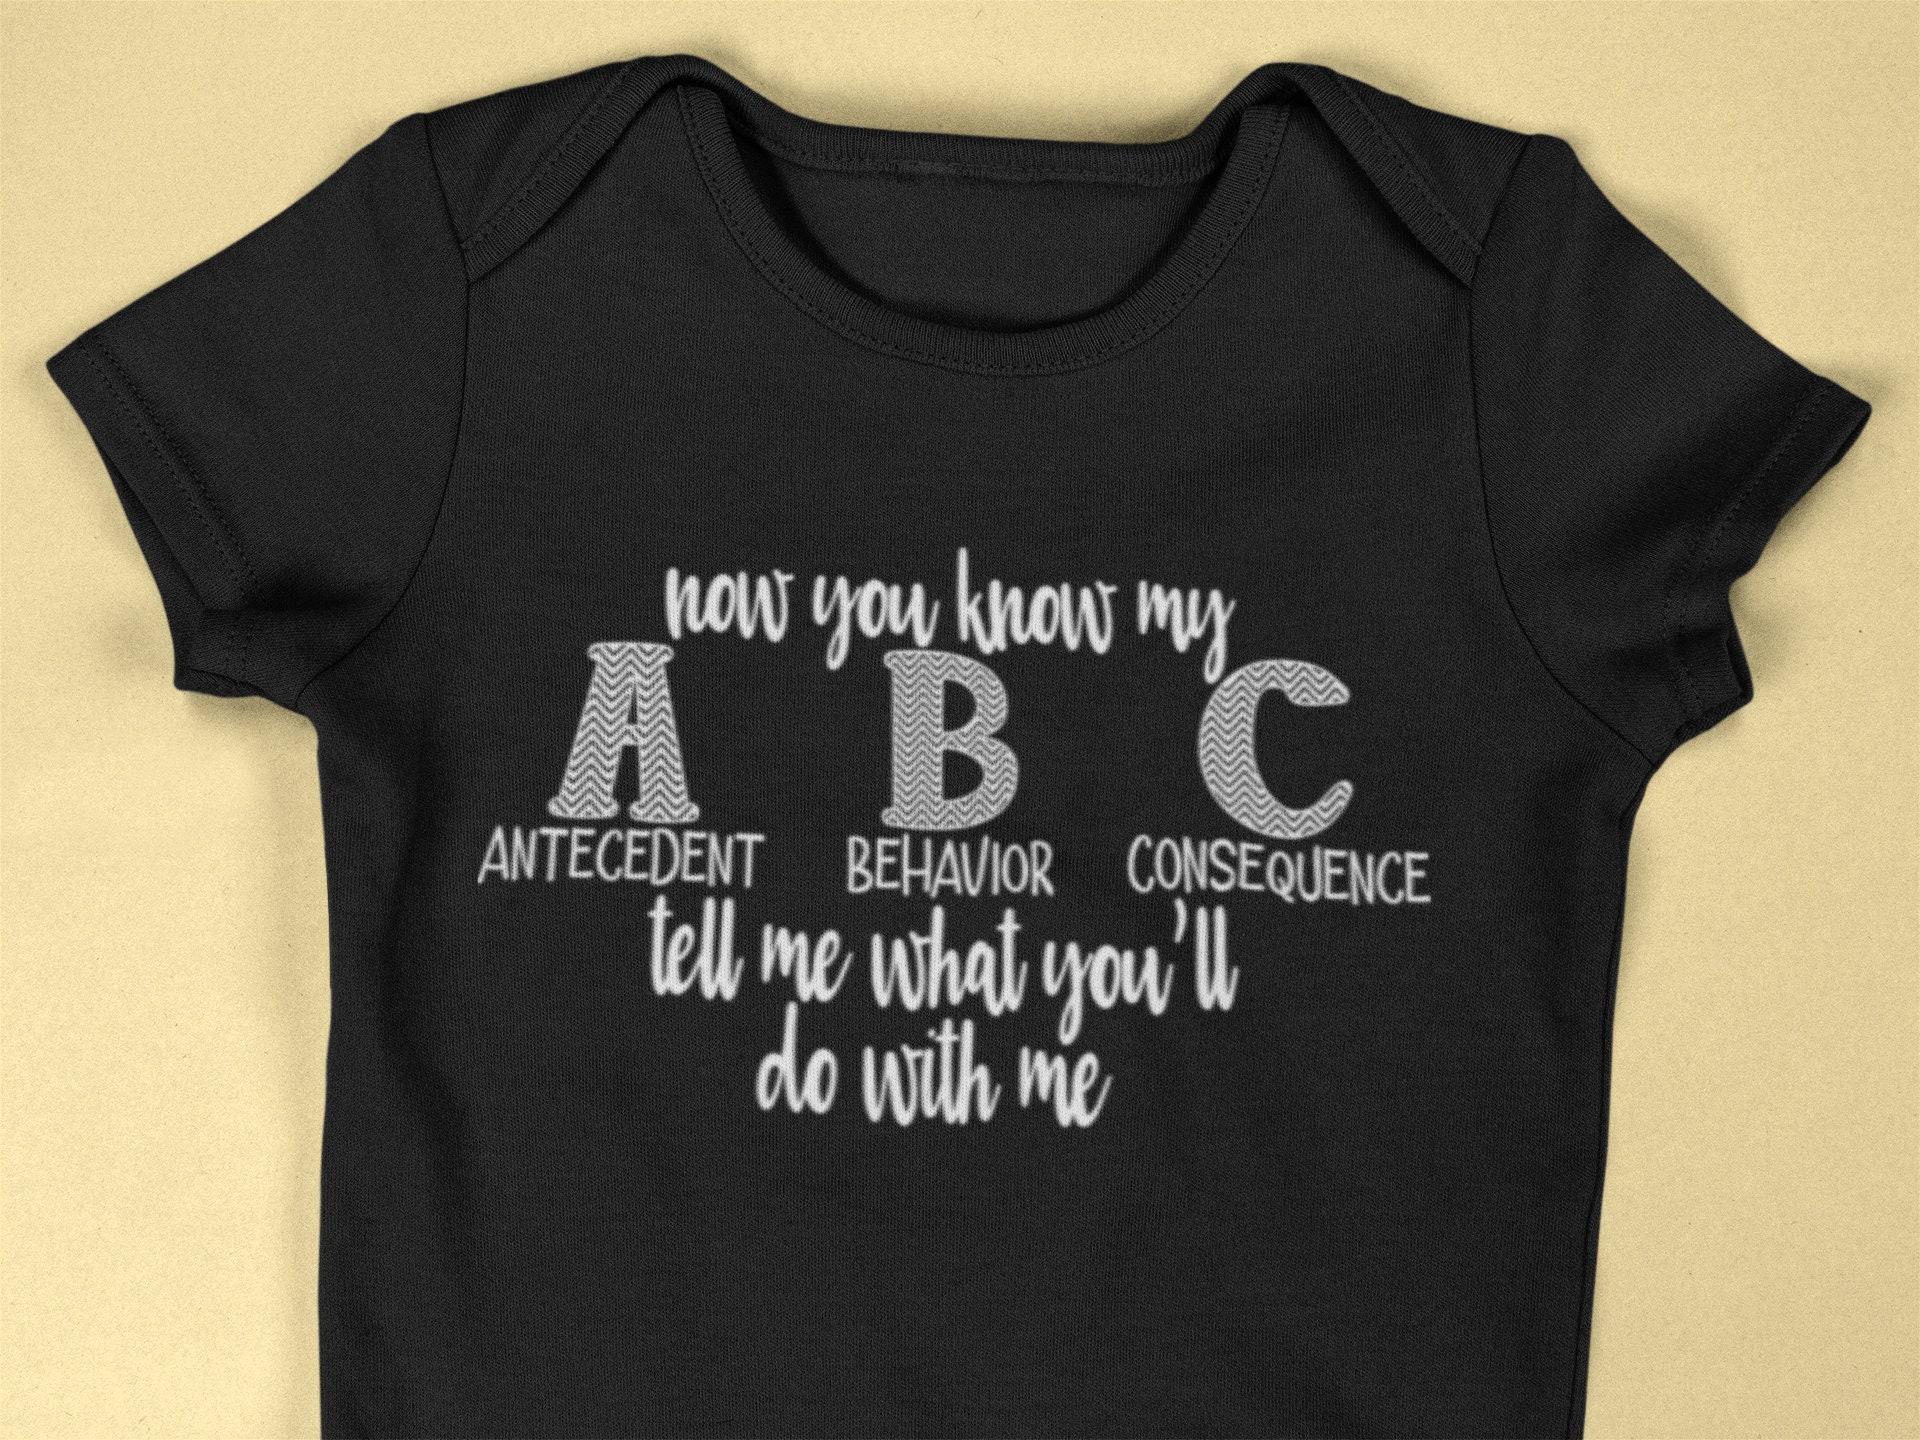 bd51e976b98 Infant ABC Shirt Infant Shirt Infant BCBA Shirt Gifts for | Etsy